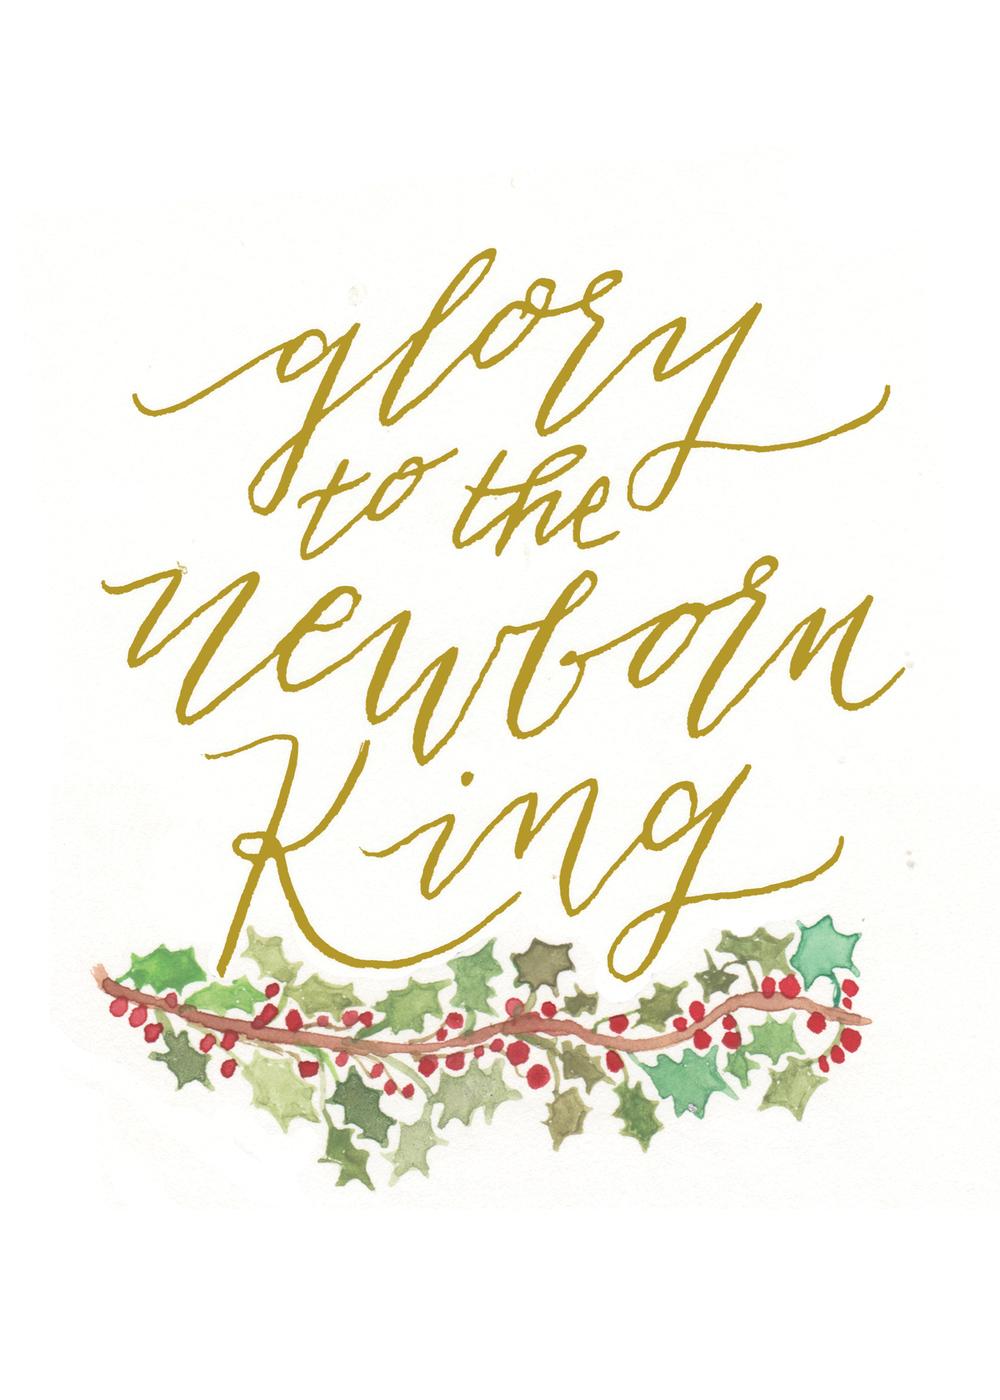 Glory-New-King-Card-small.jpg